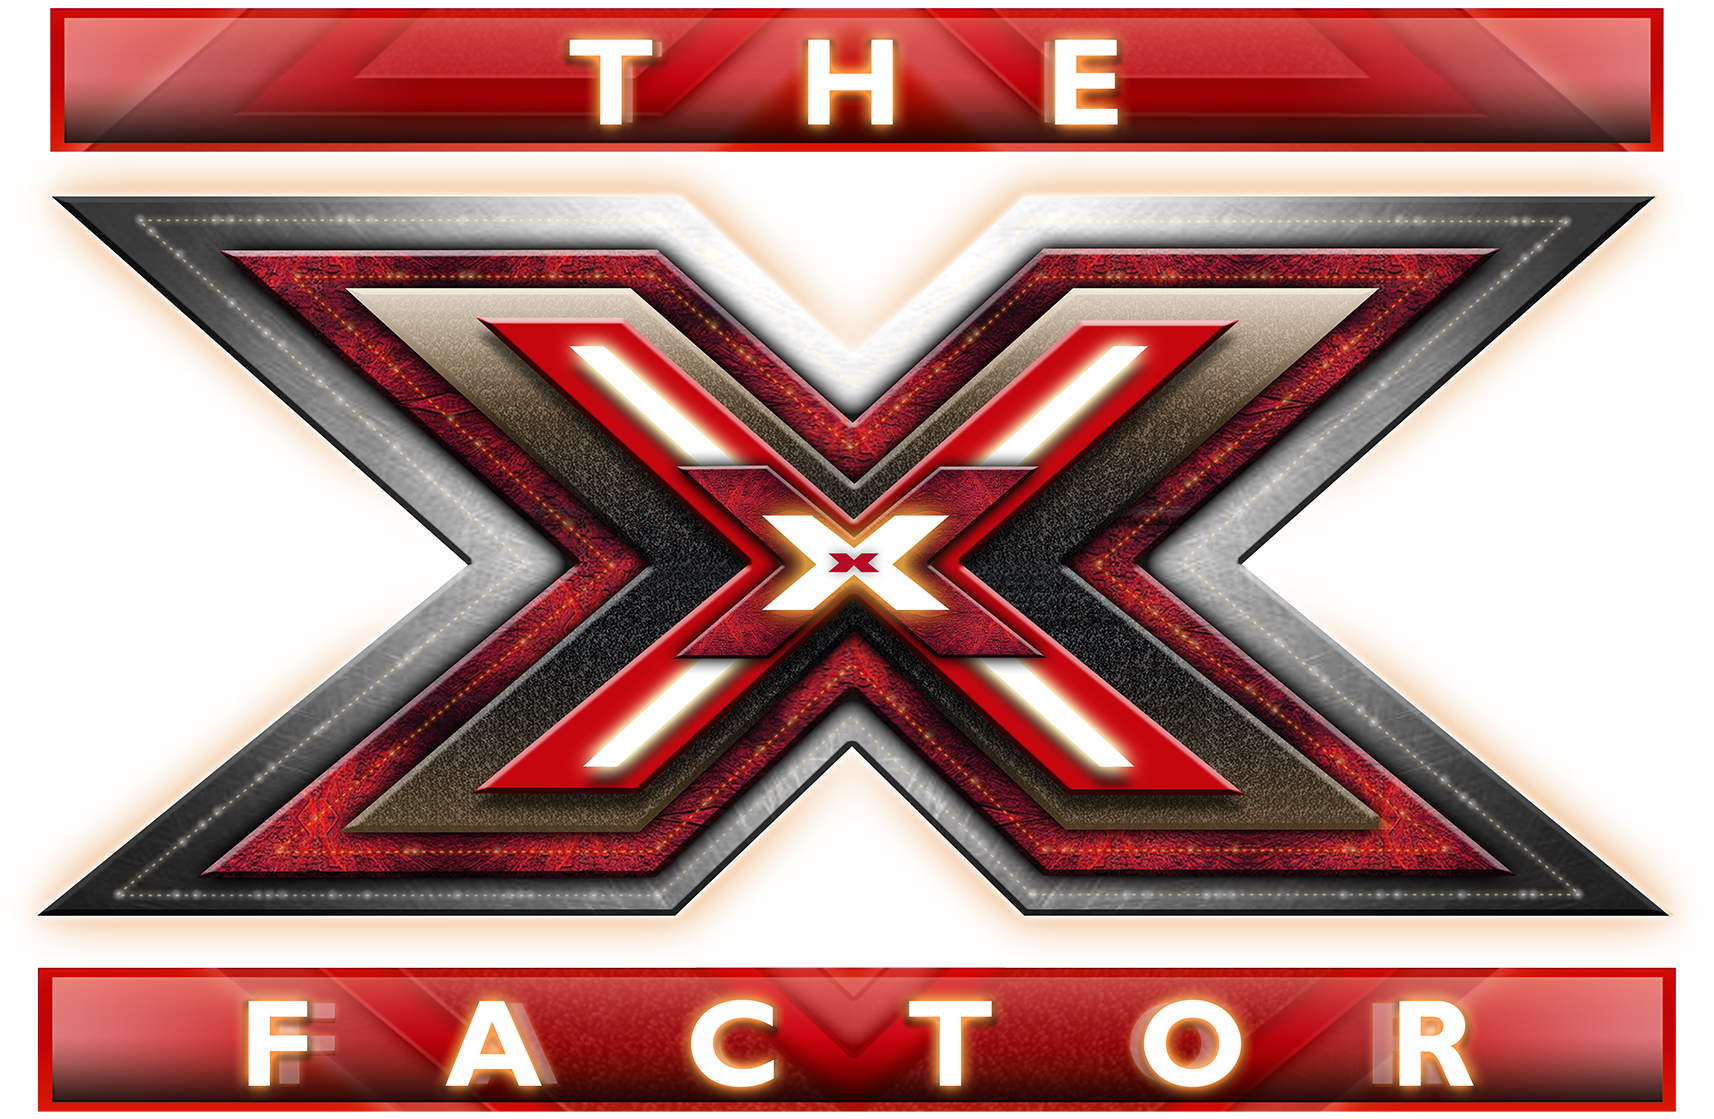 The X Factor (UK TV series) | Logopedia | FANDOM powered by